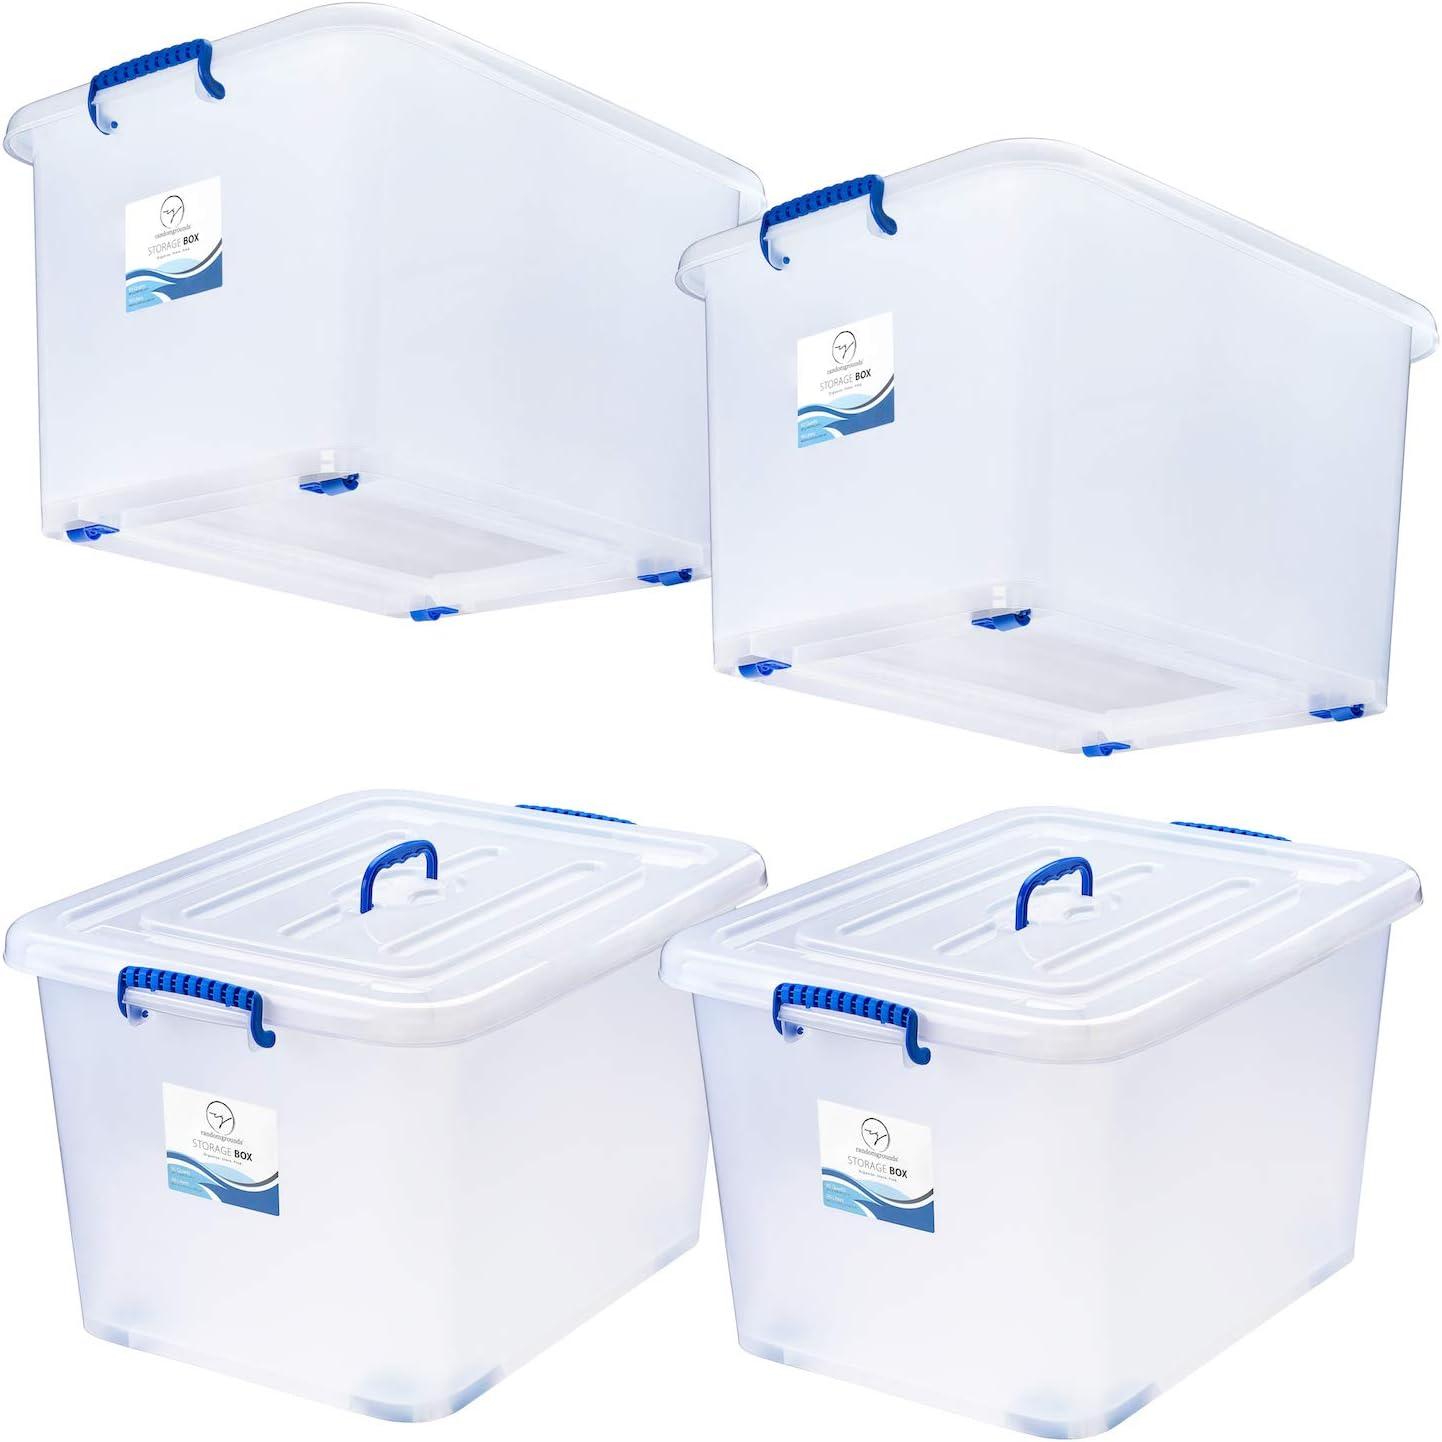 Large Clear Plastic Box